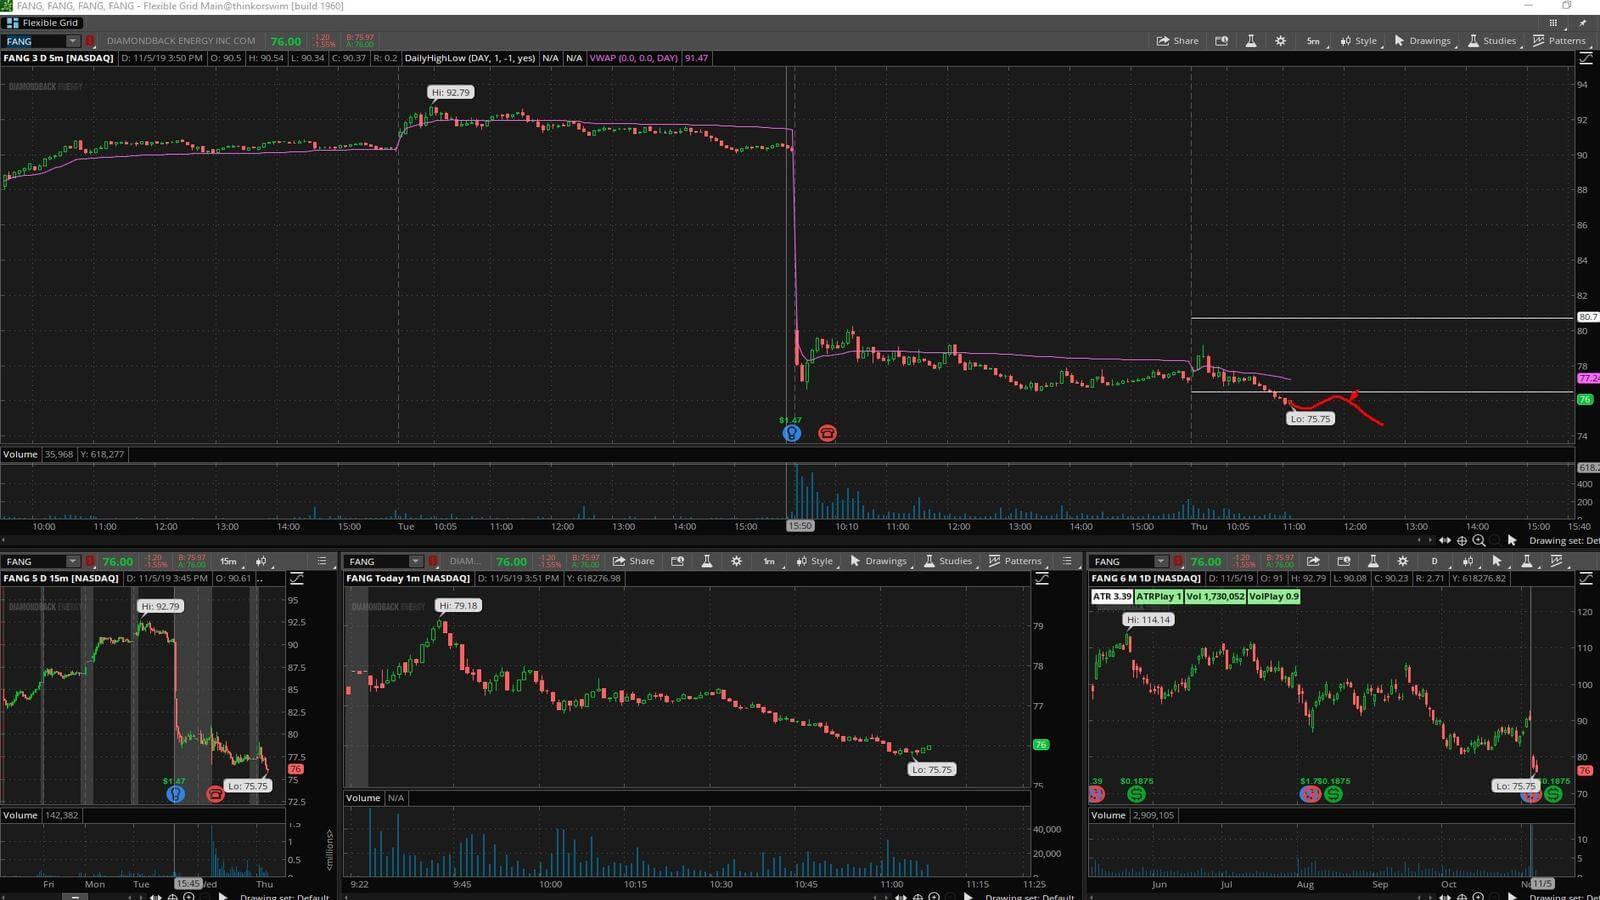 FANG - график акции на фондовой бирже